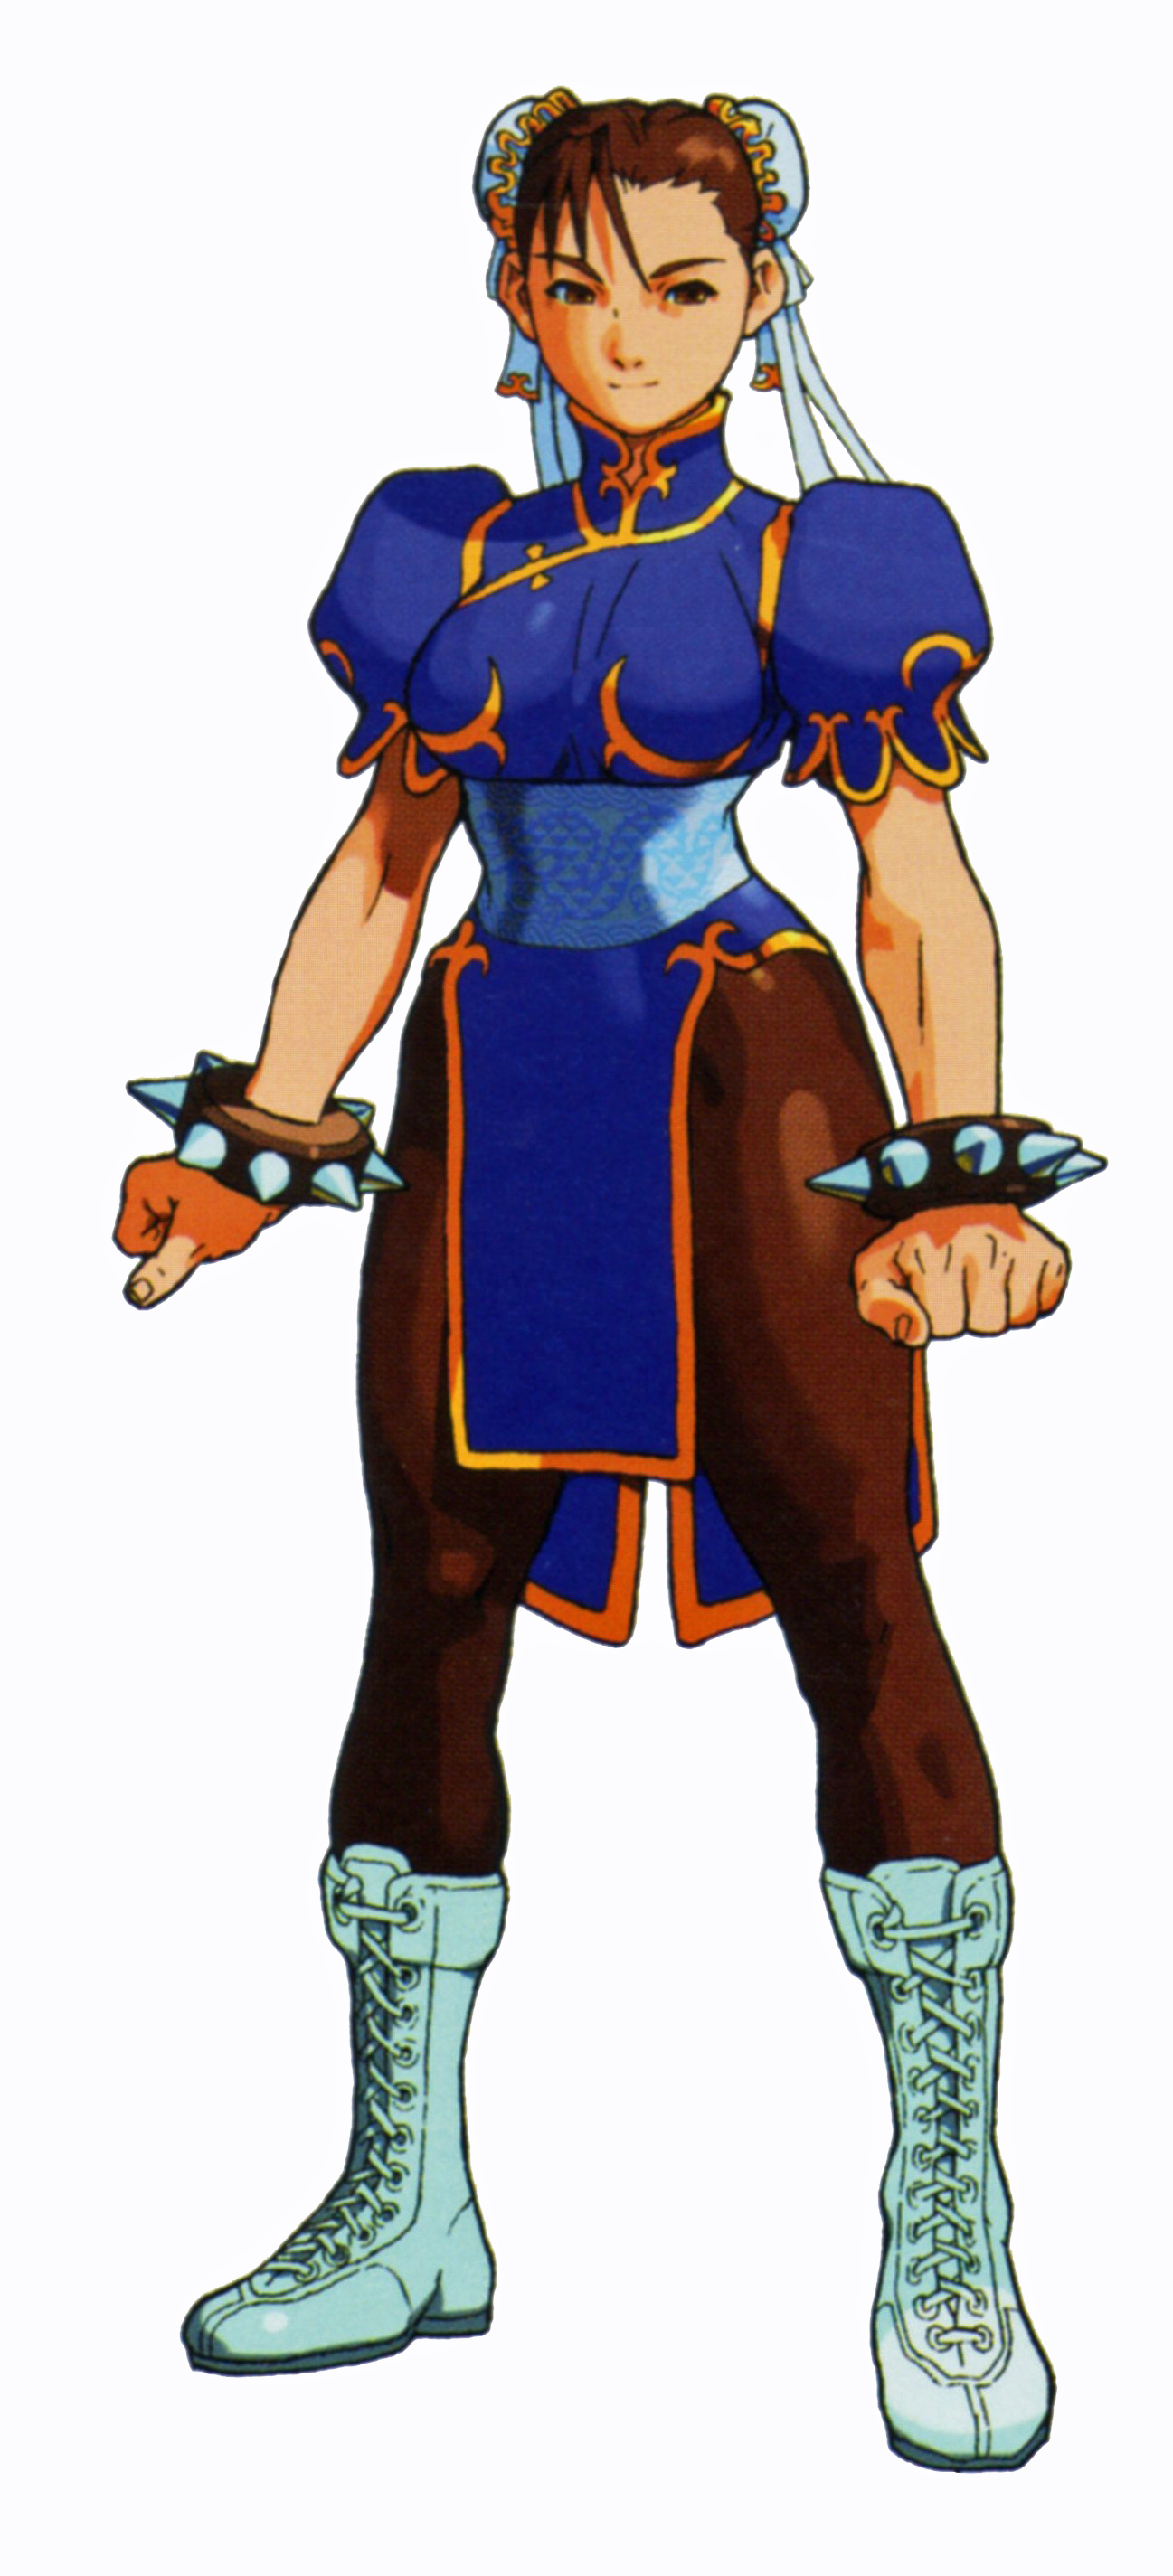 Chun Li Xvsf Png 1297 2849 Street Fighter Characters Chun Li Street Fighter Sakura Street Fighter